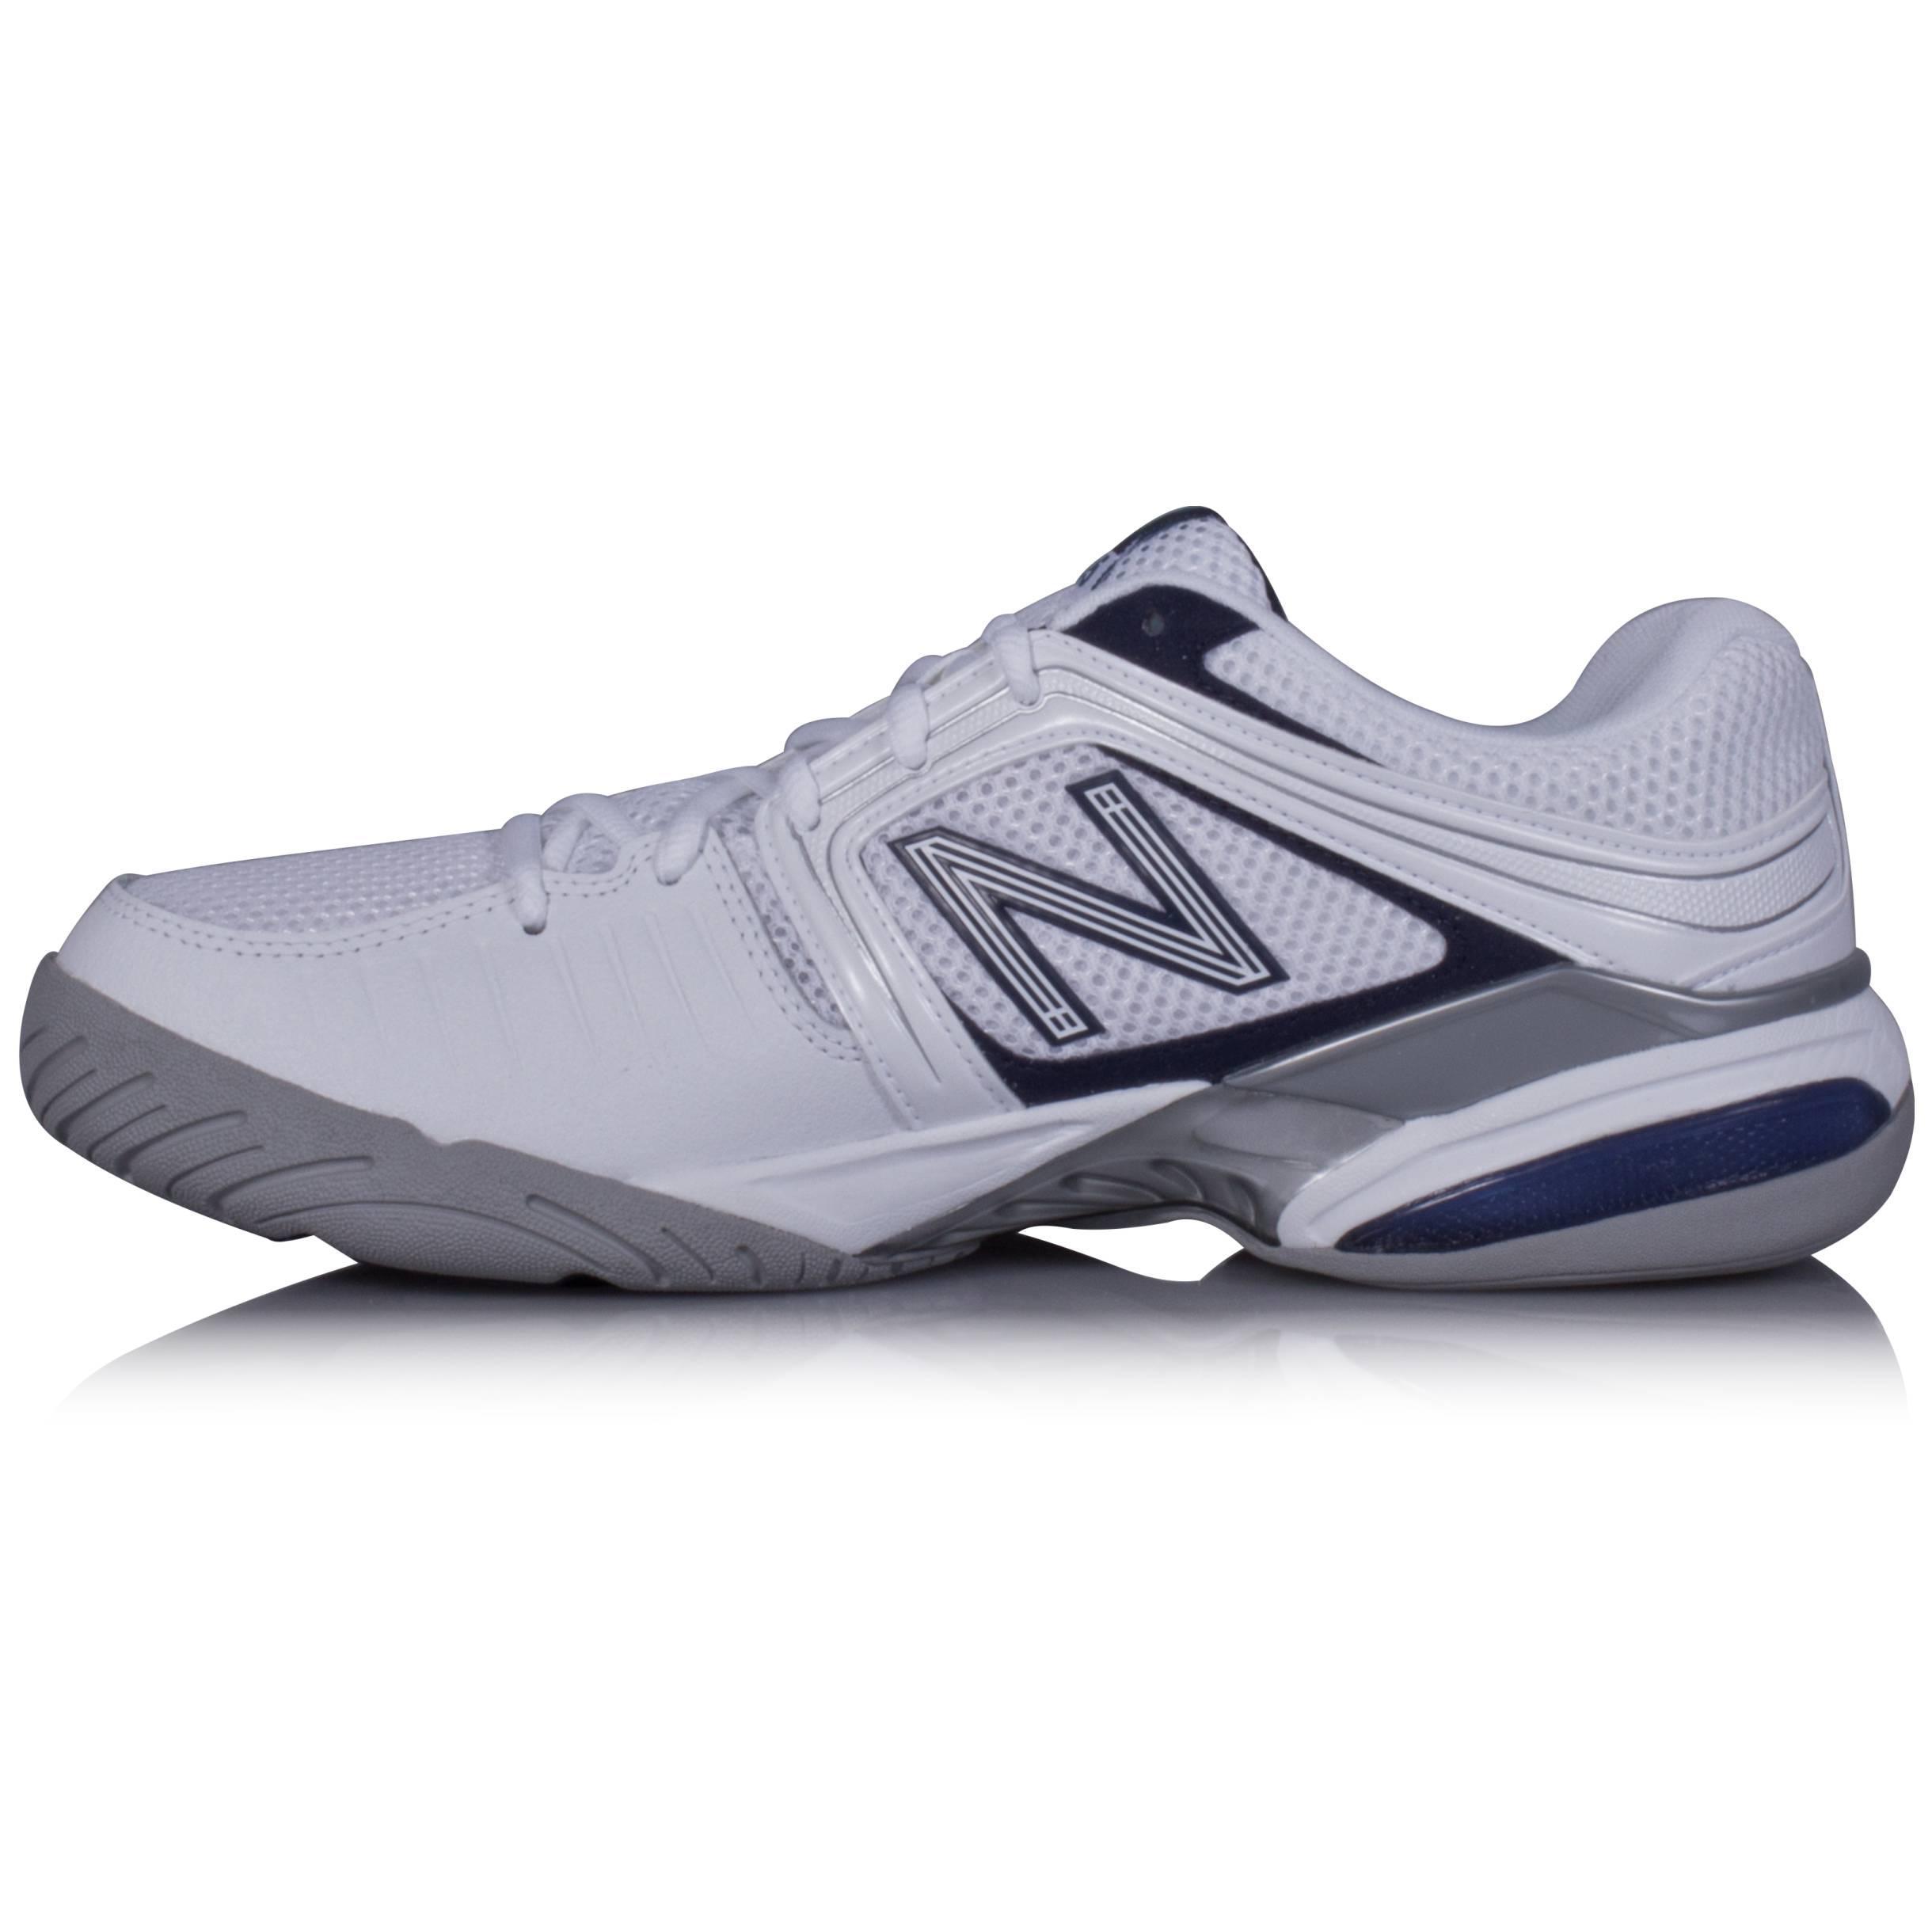 new balance mc 1005 d s tennis shoe